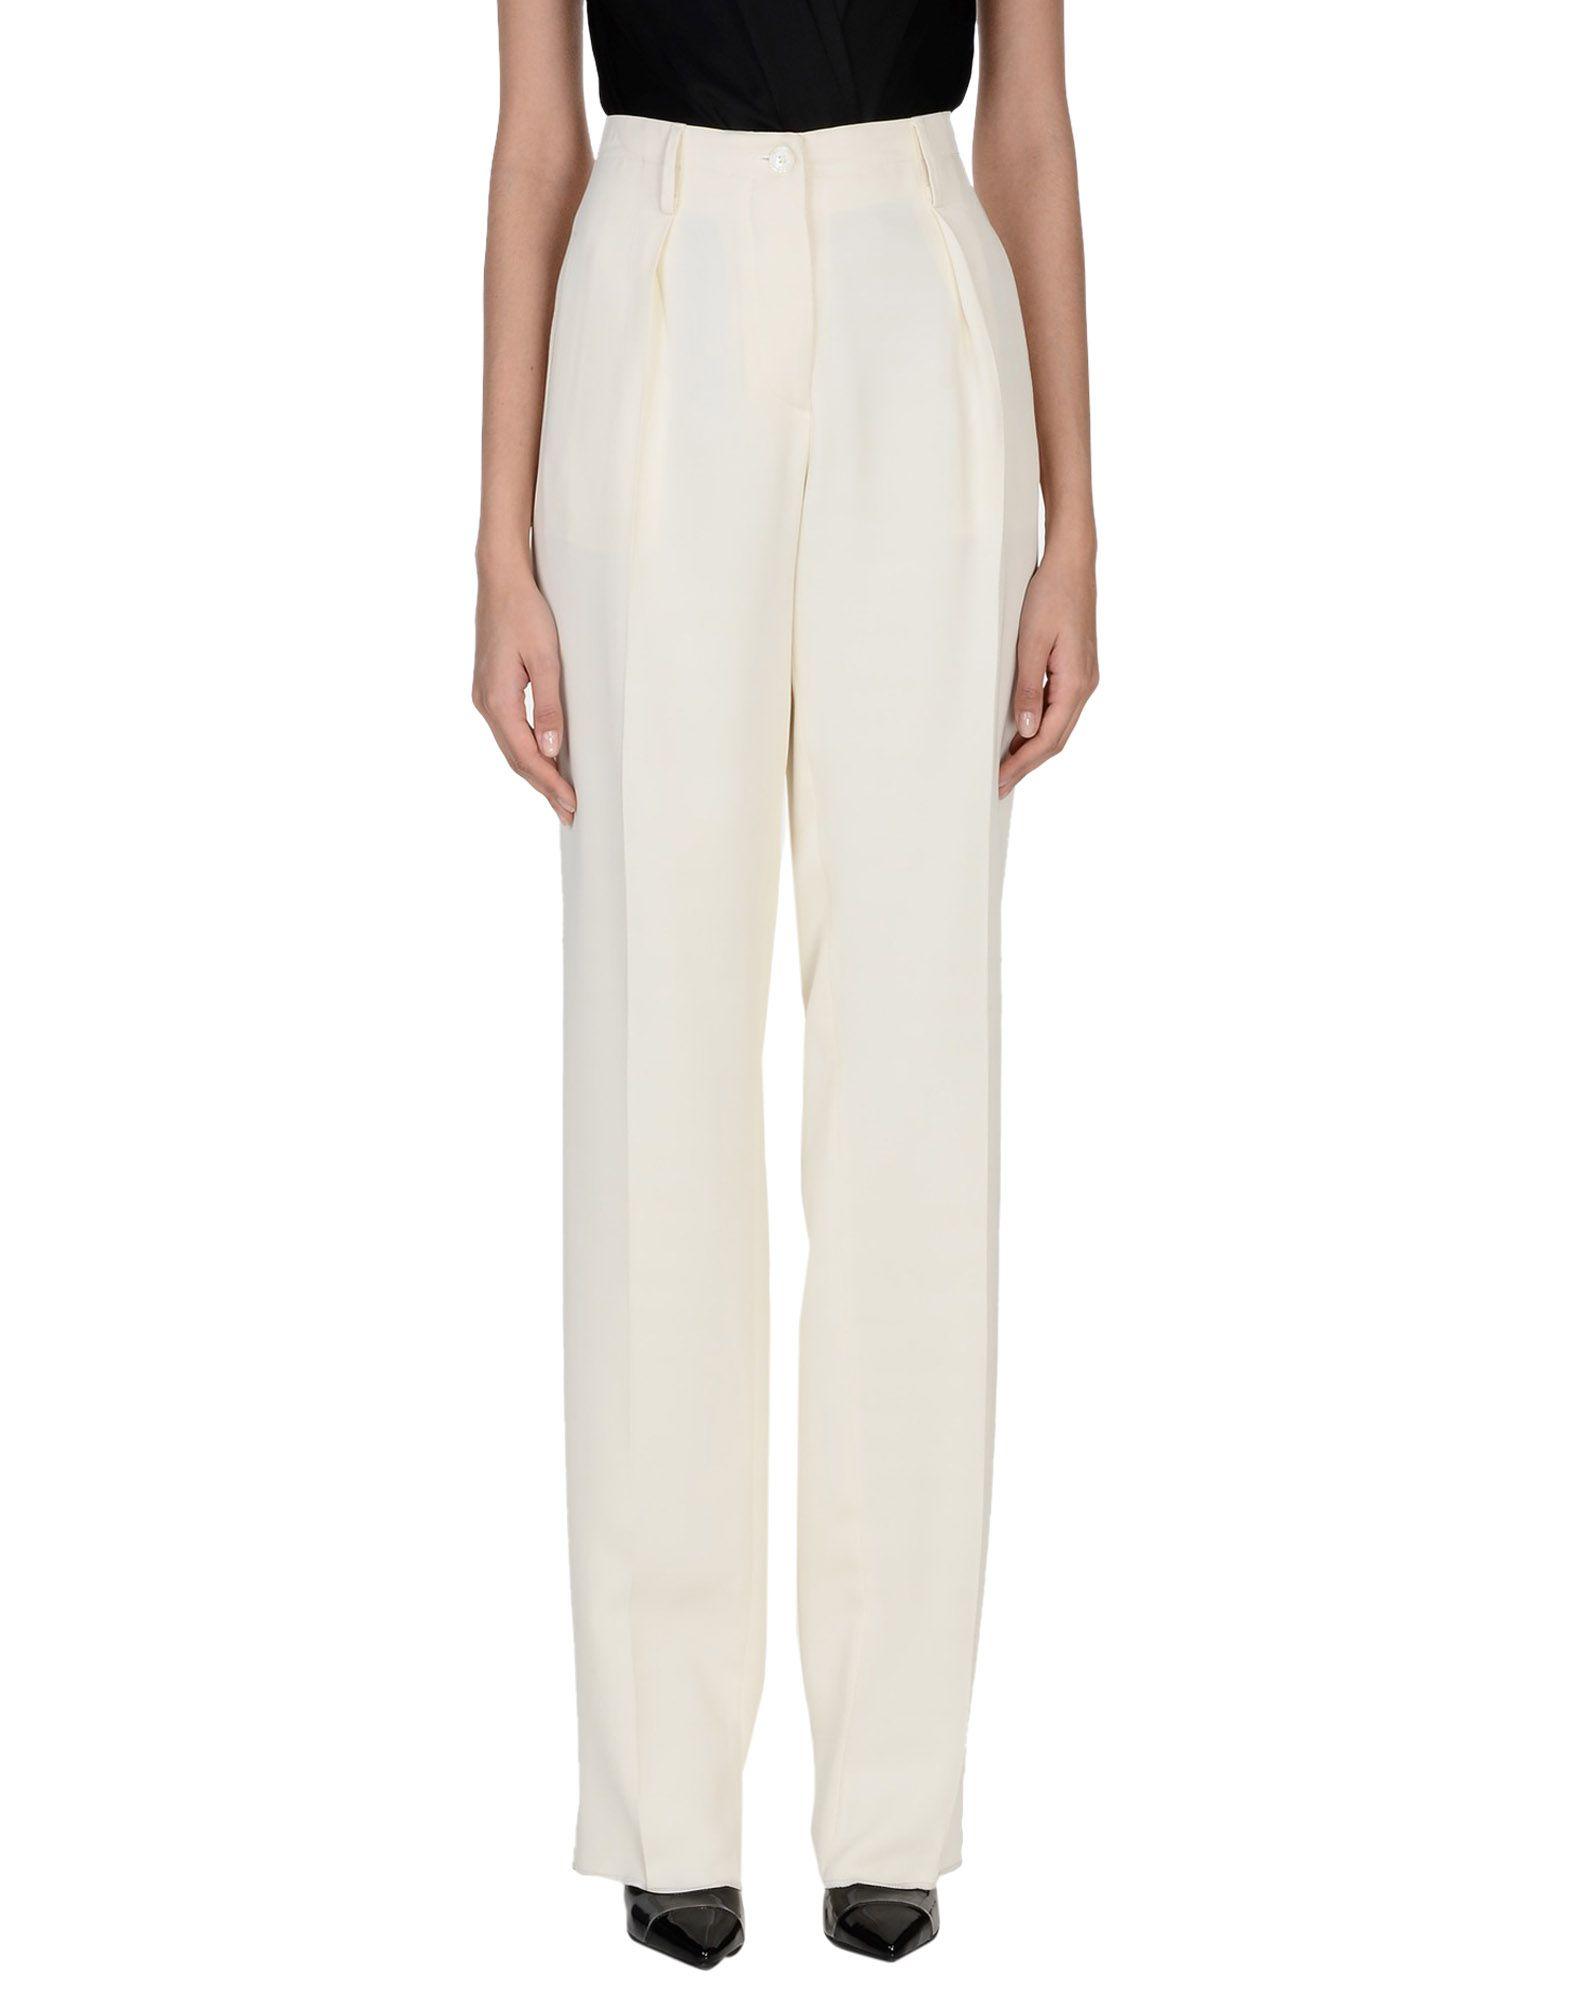 Pantalone Bottega Veneta Donna - Acquista online su 2DOv30K